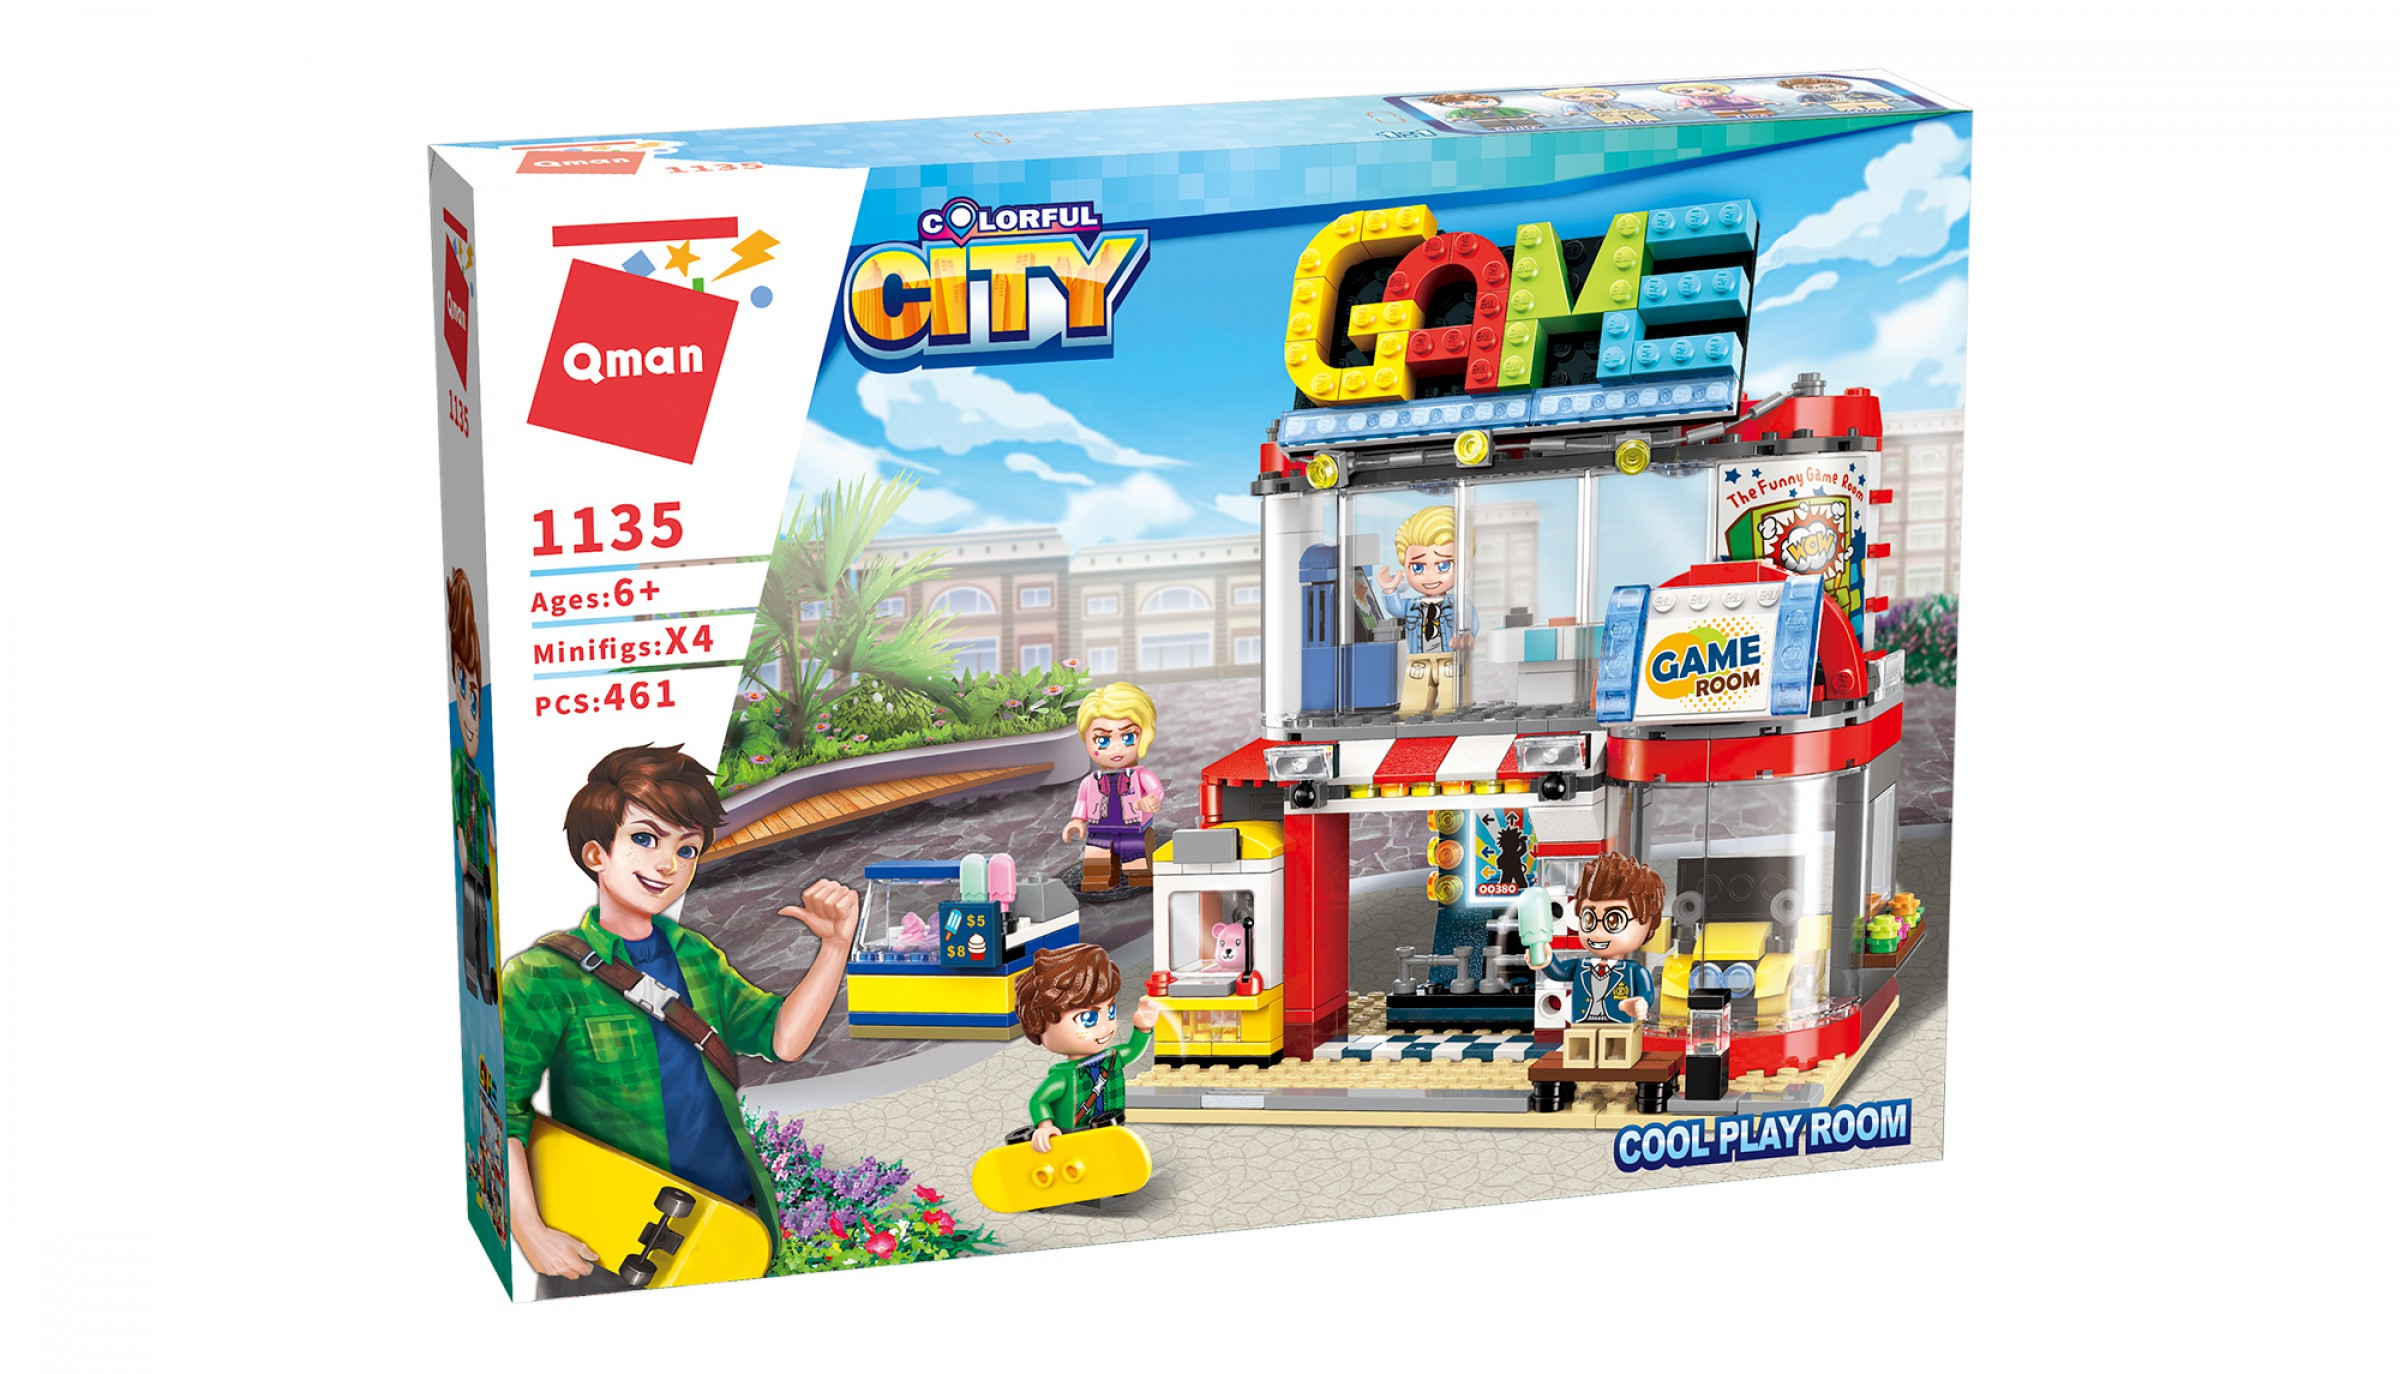 Qman Colorful City 1135 Videoherna